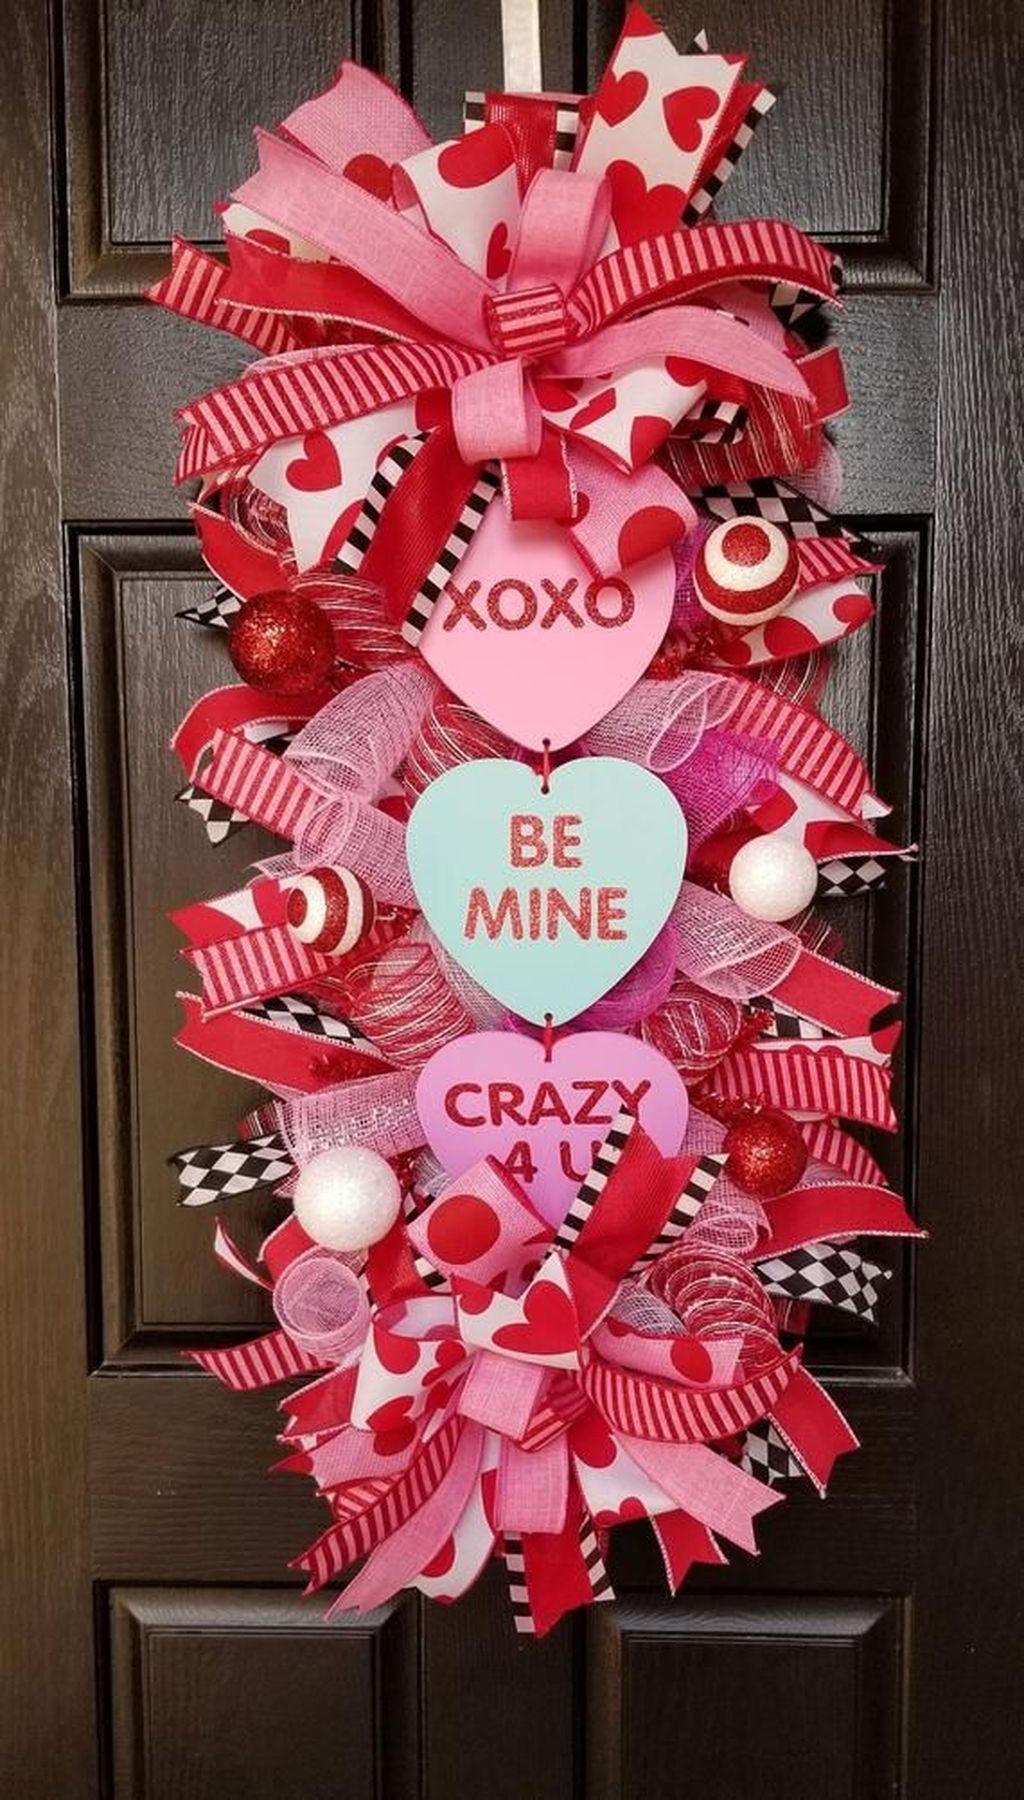 20 Cute Valentine Door Decorations Ideas To Spread The Seasons Greetings Lovahomy